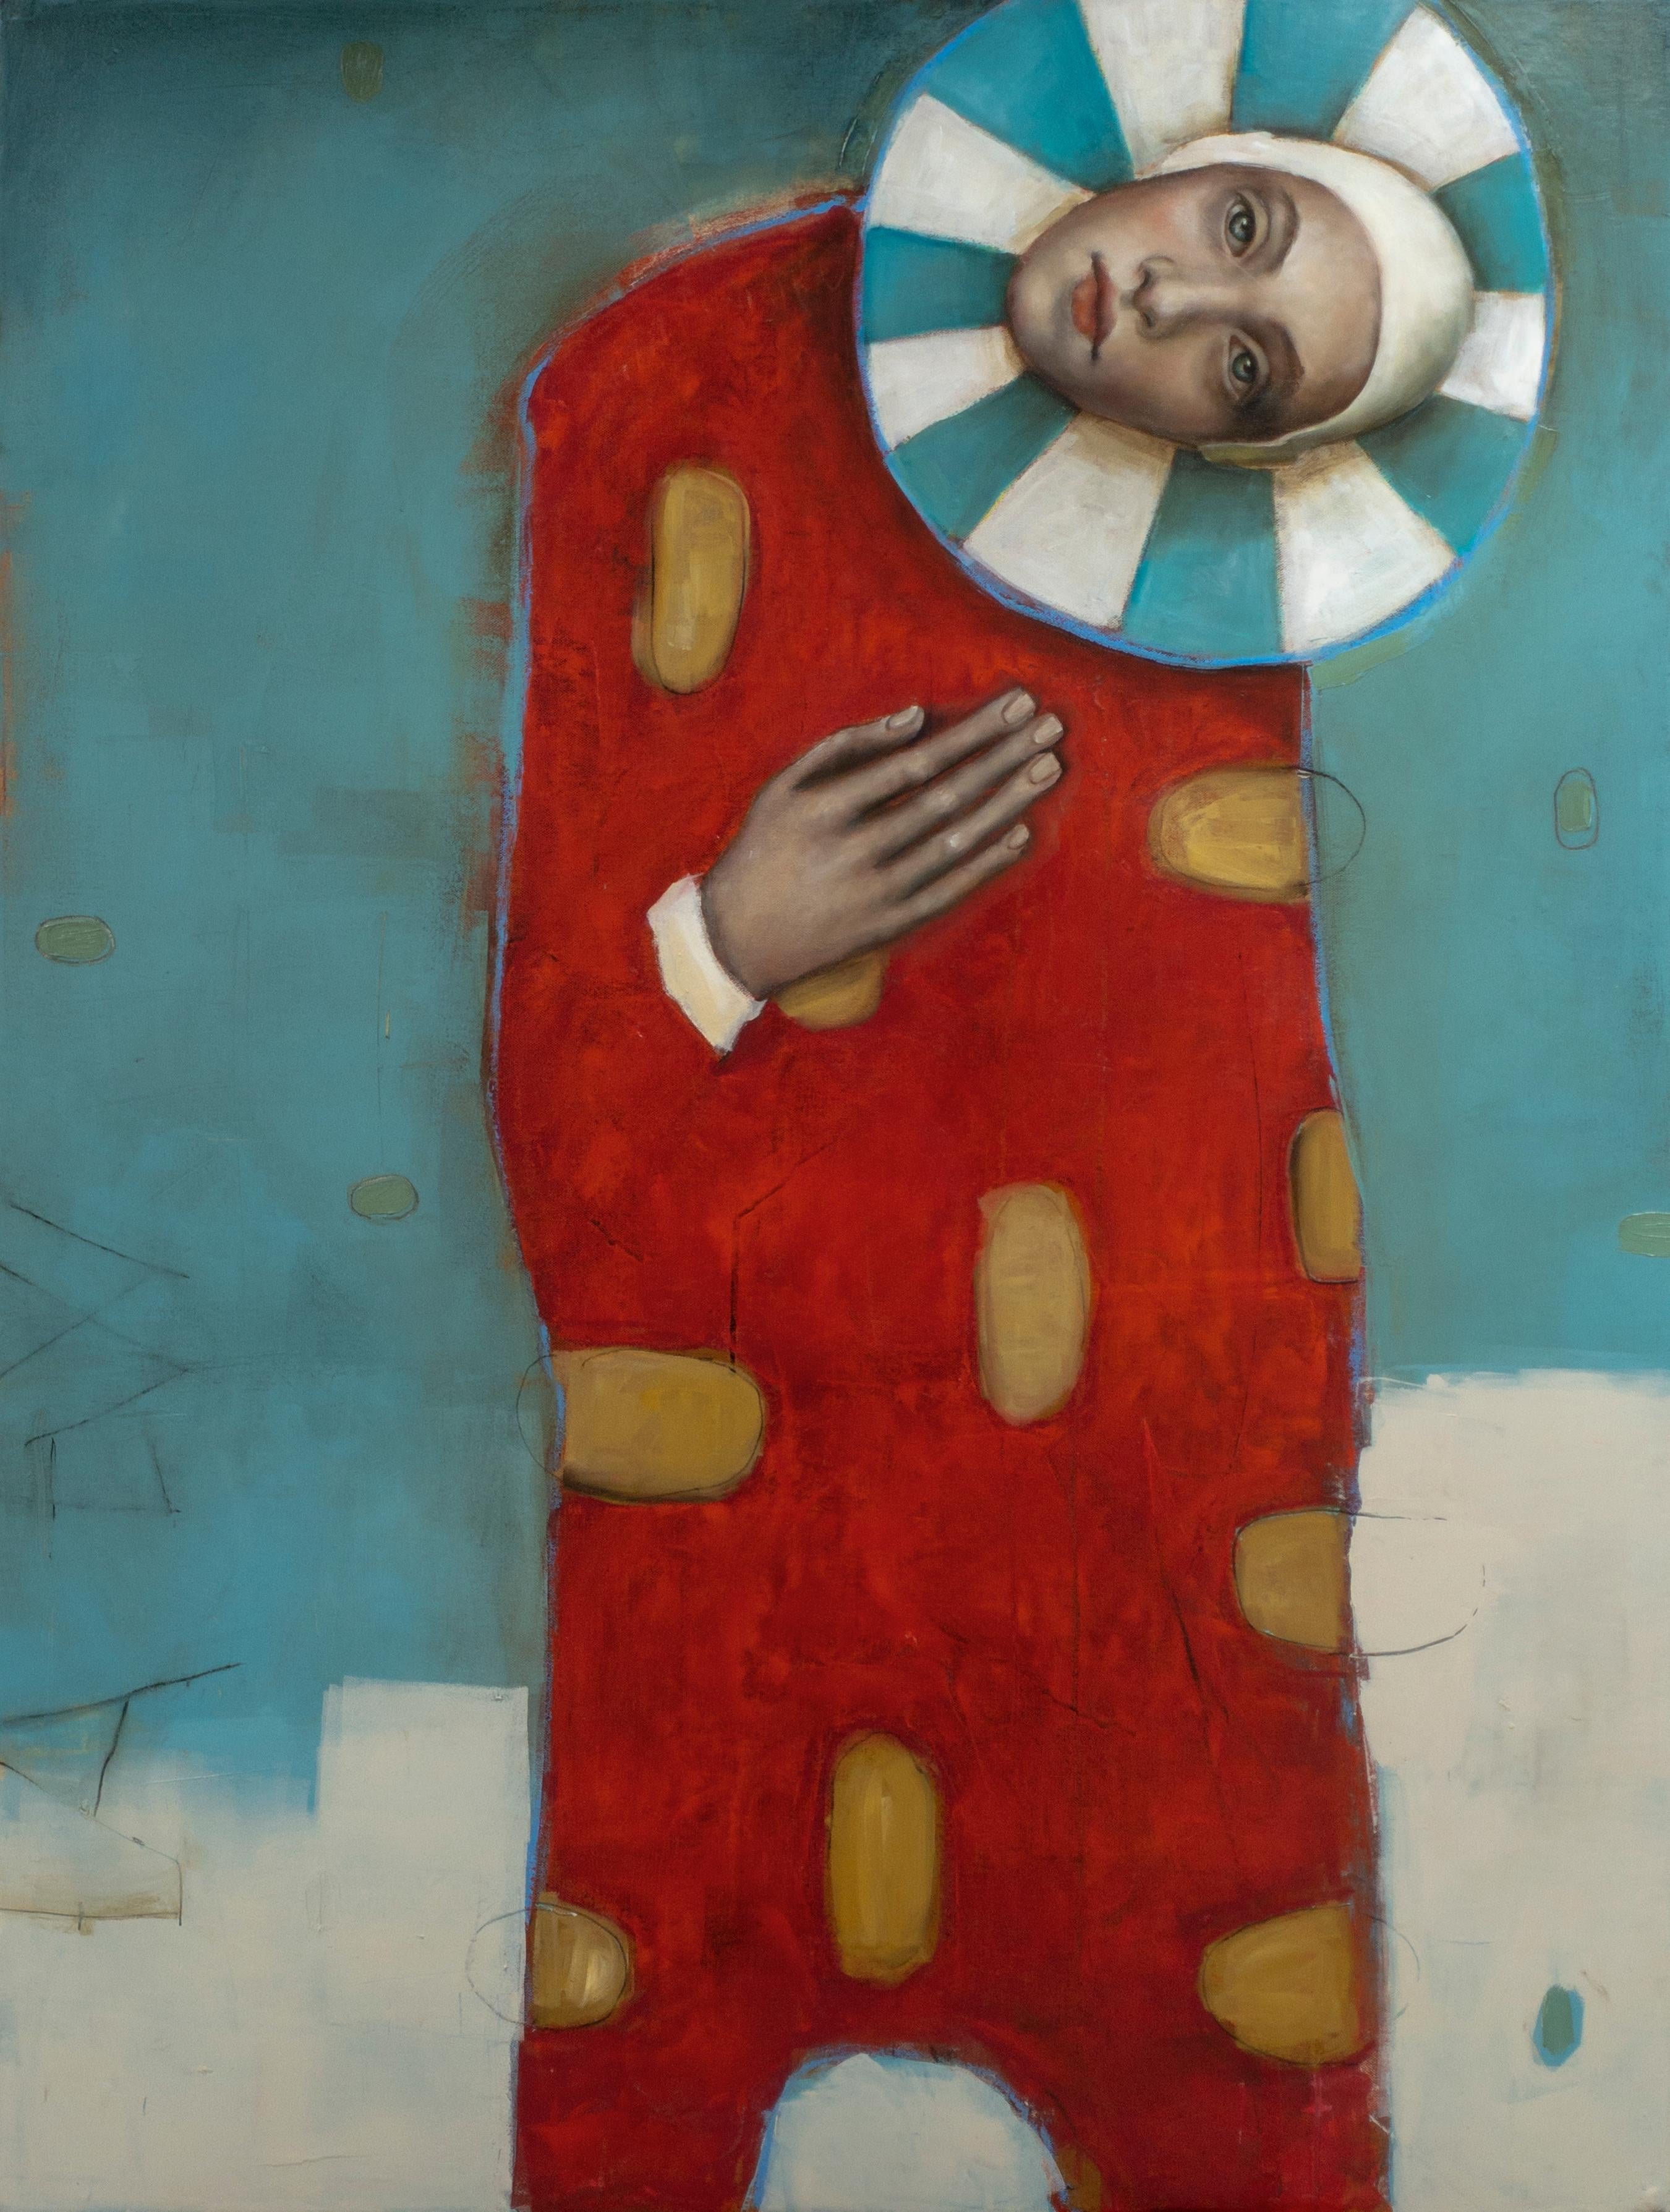 """St. Luke"", Oil on canvas, mysterious and whimsical pop art portrait master"